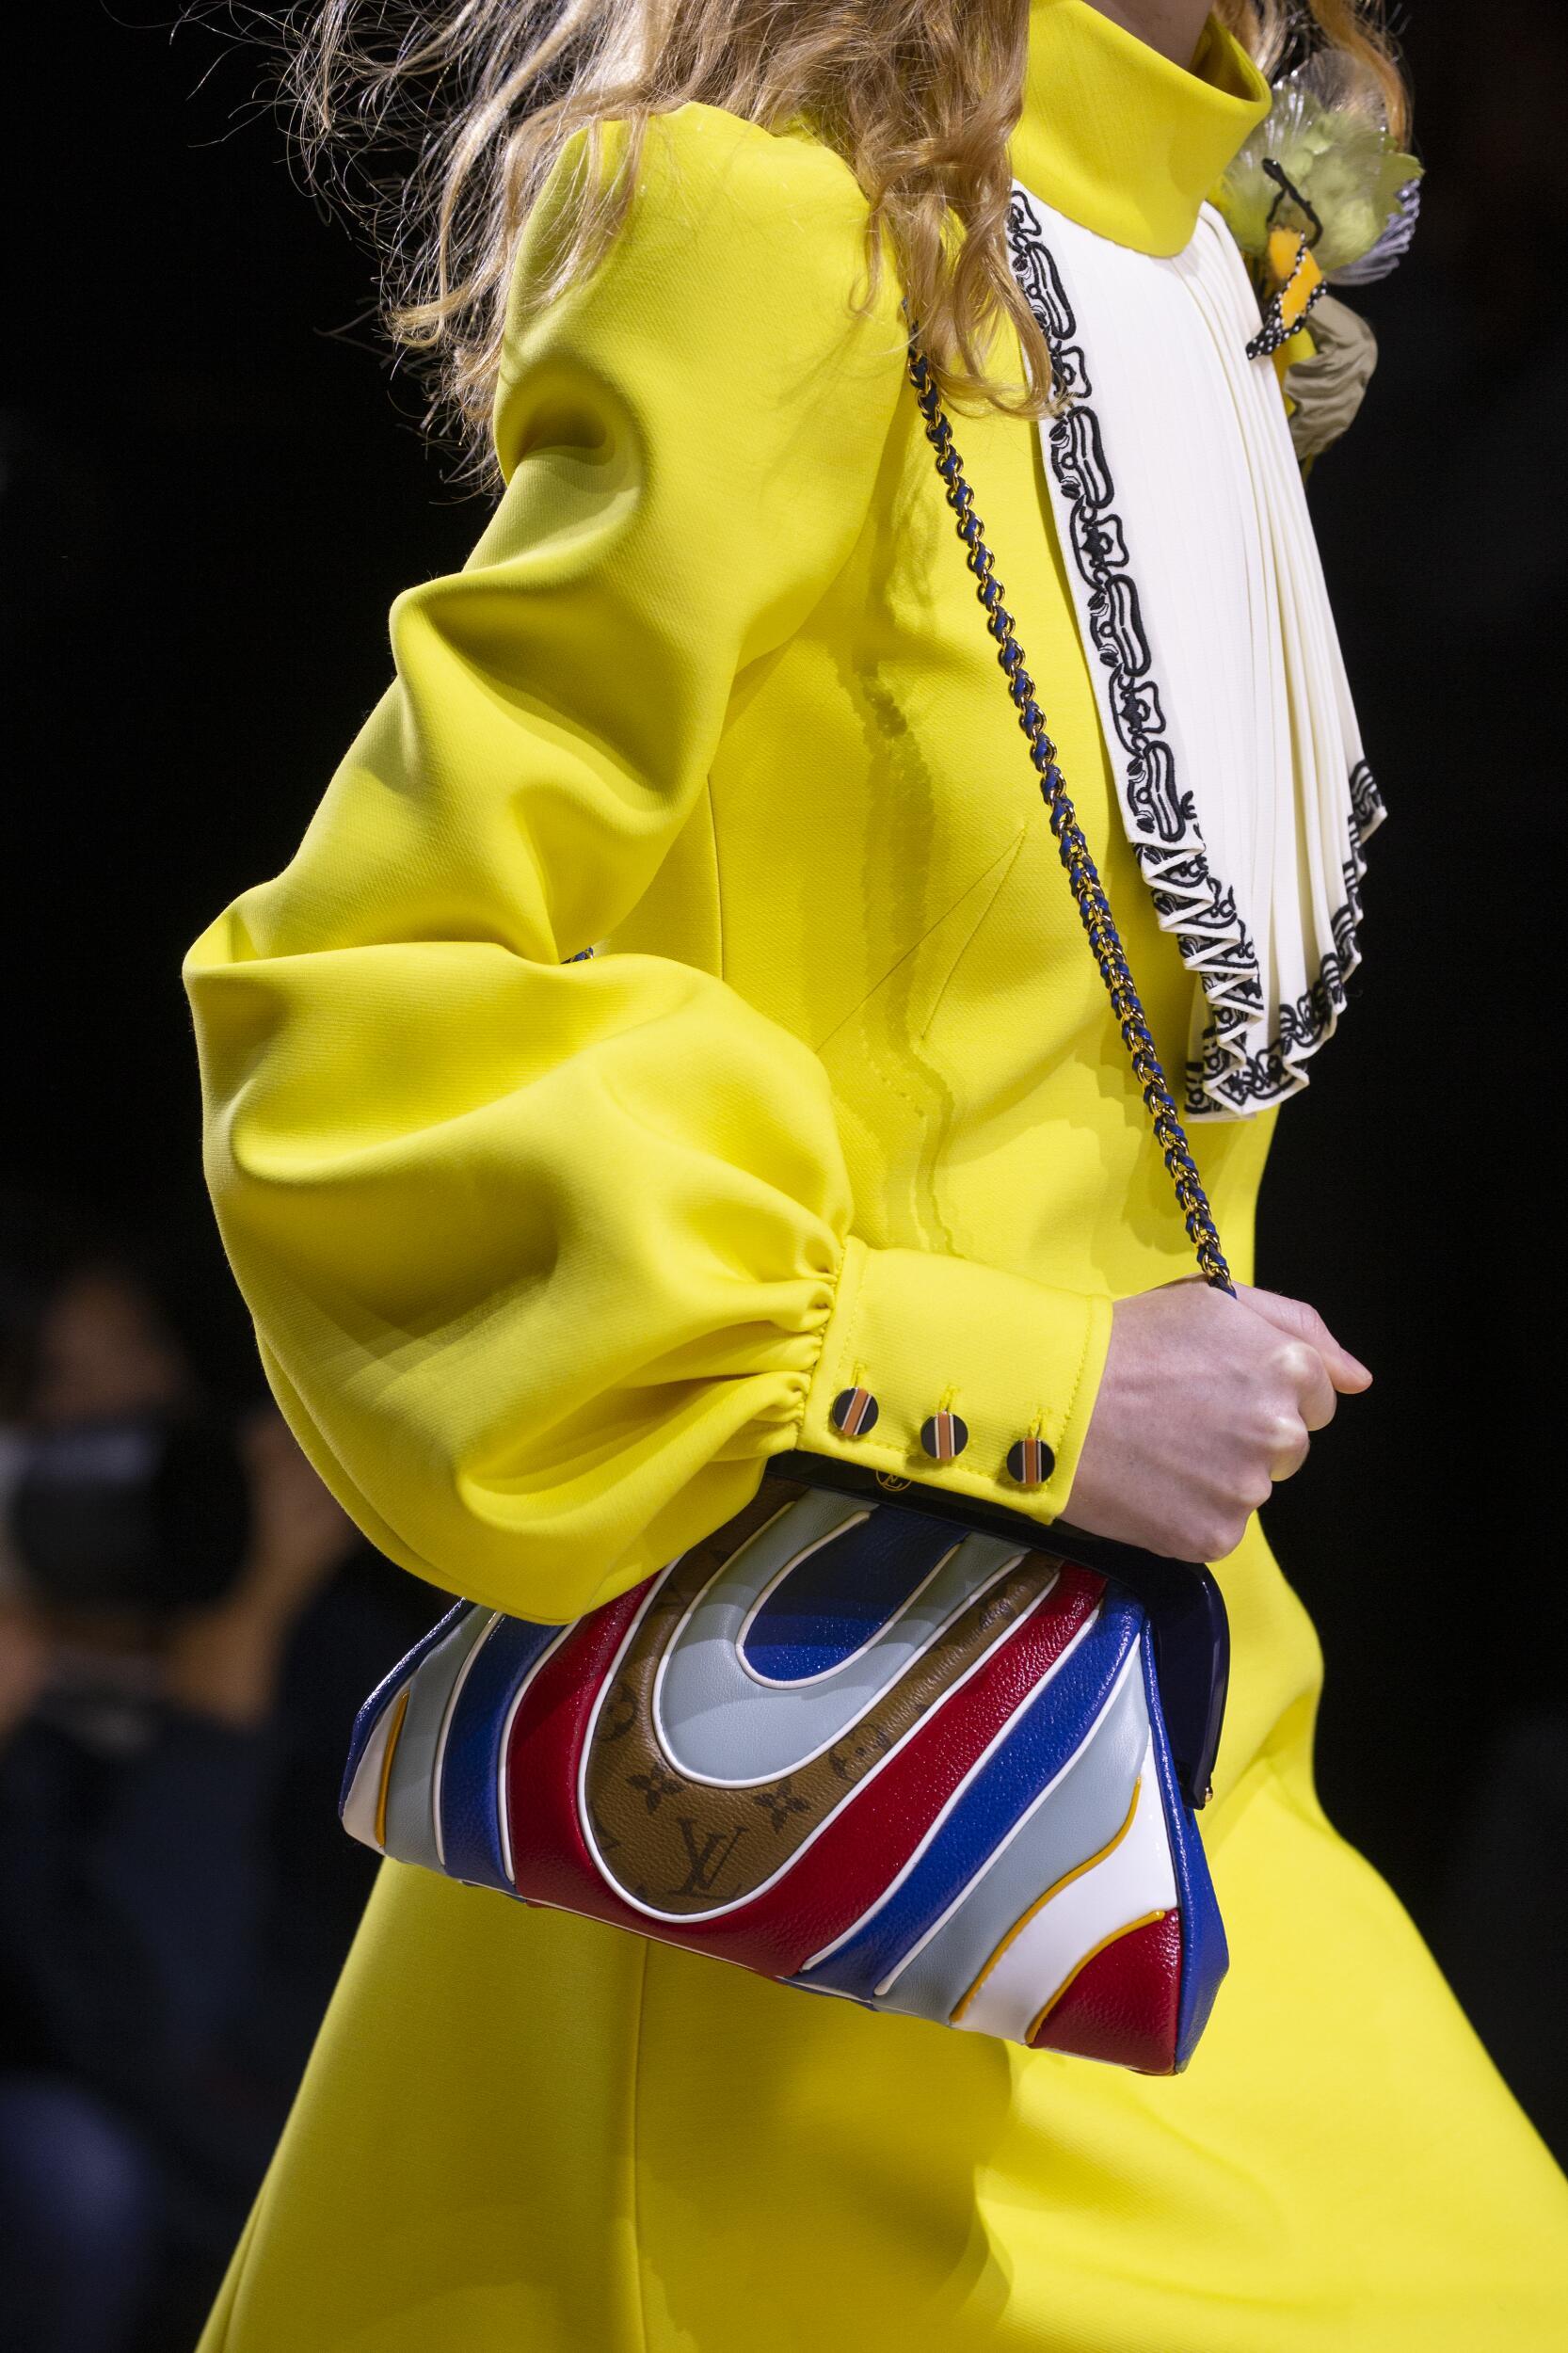 Bag Louis Vuitton Spring Summer 2020 Women's Collection Paris Fashion Week